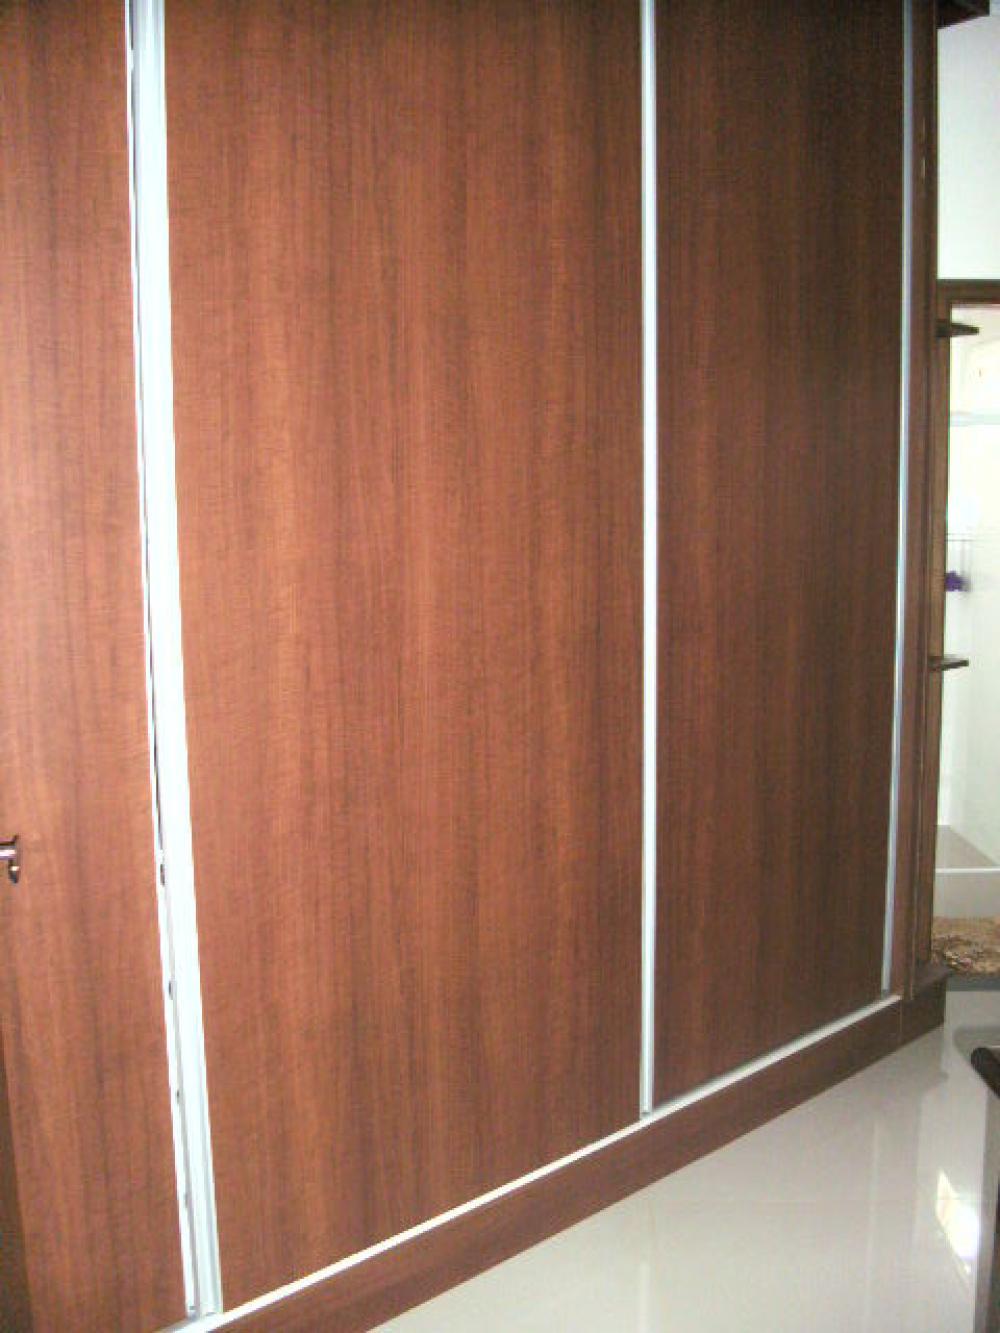 Comprar Casa / Condomínio em Mirassol R$ 750.000,00 - Foto 11